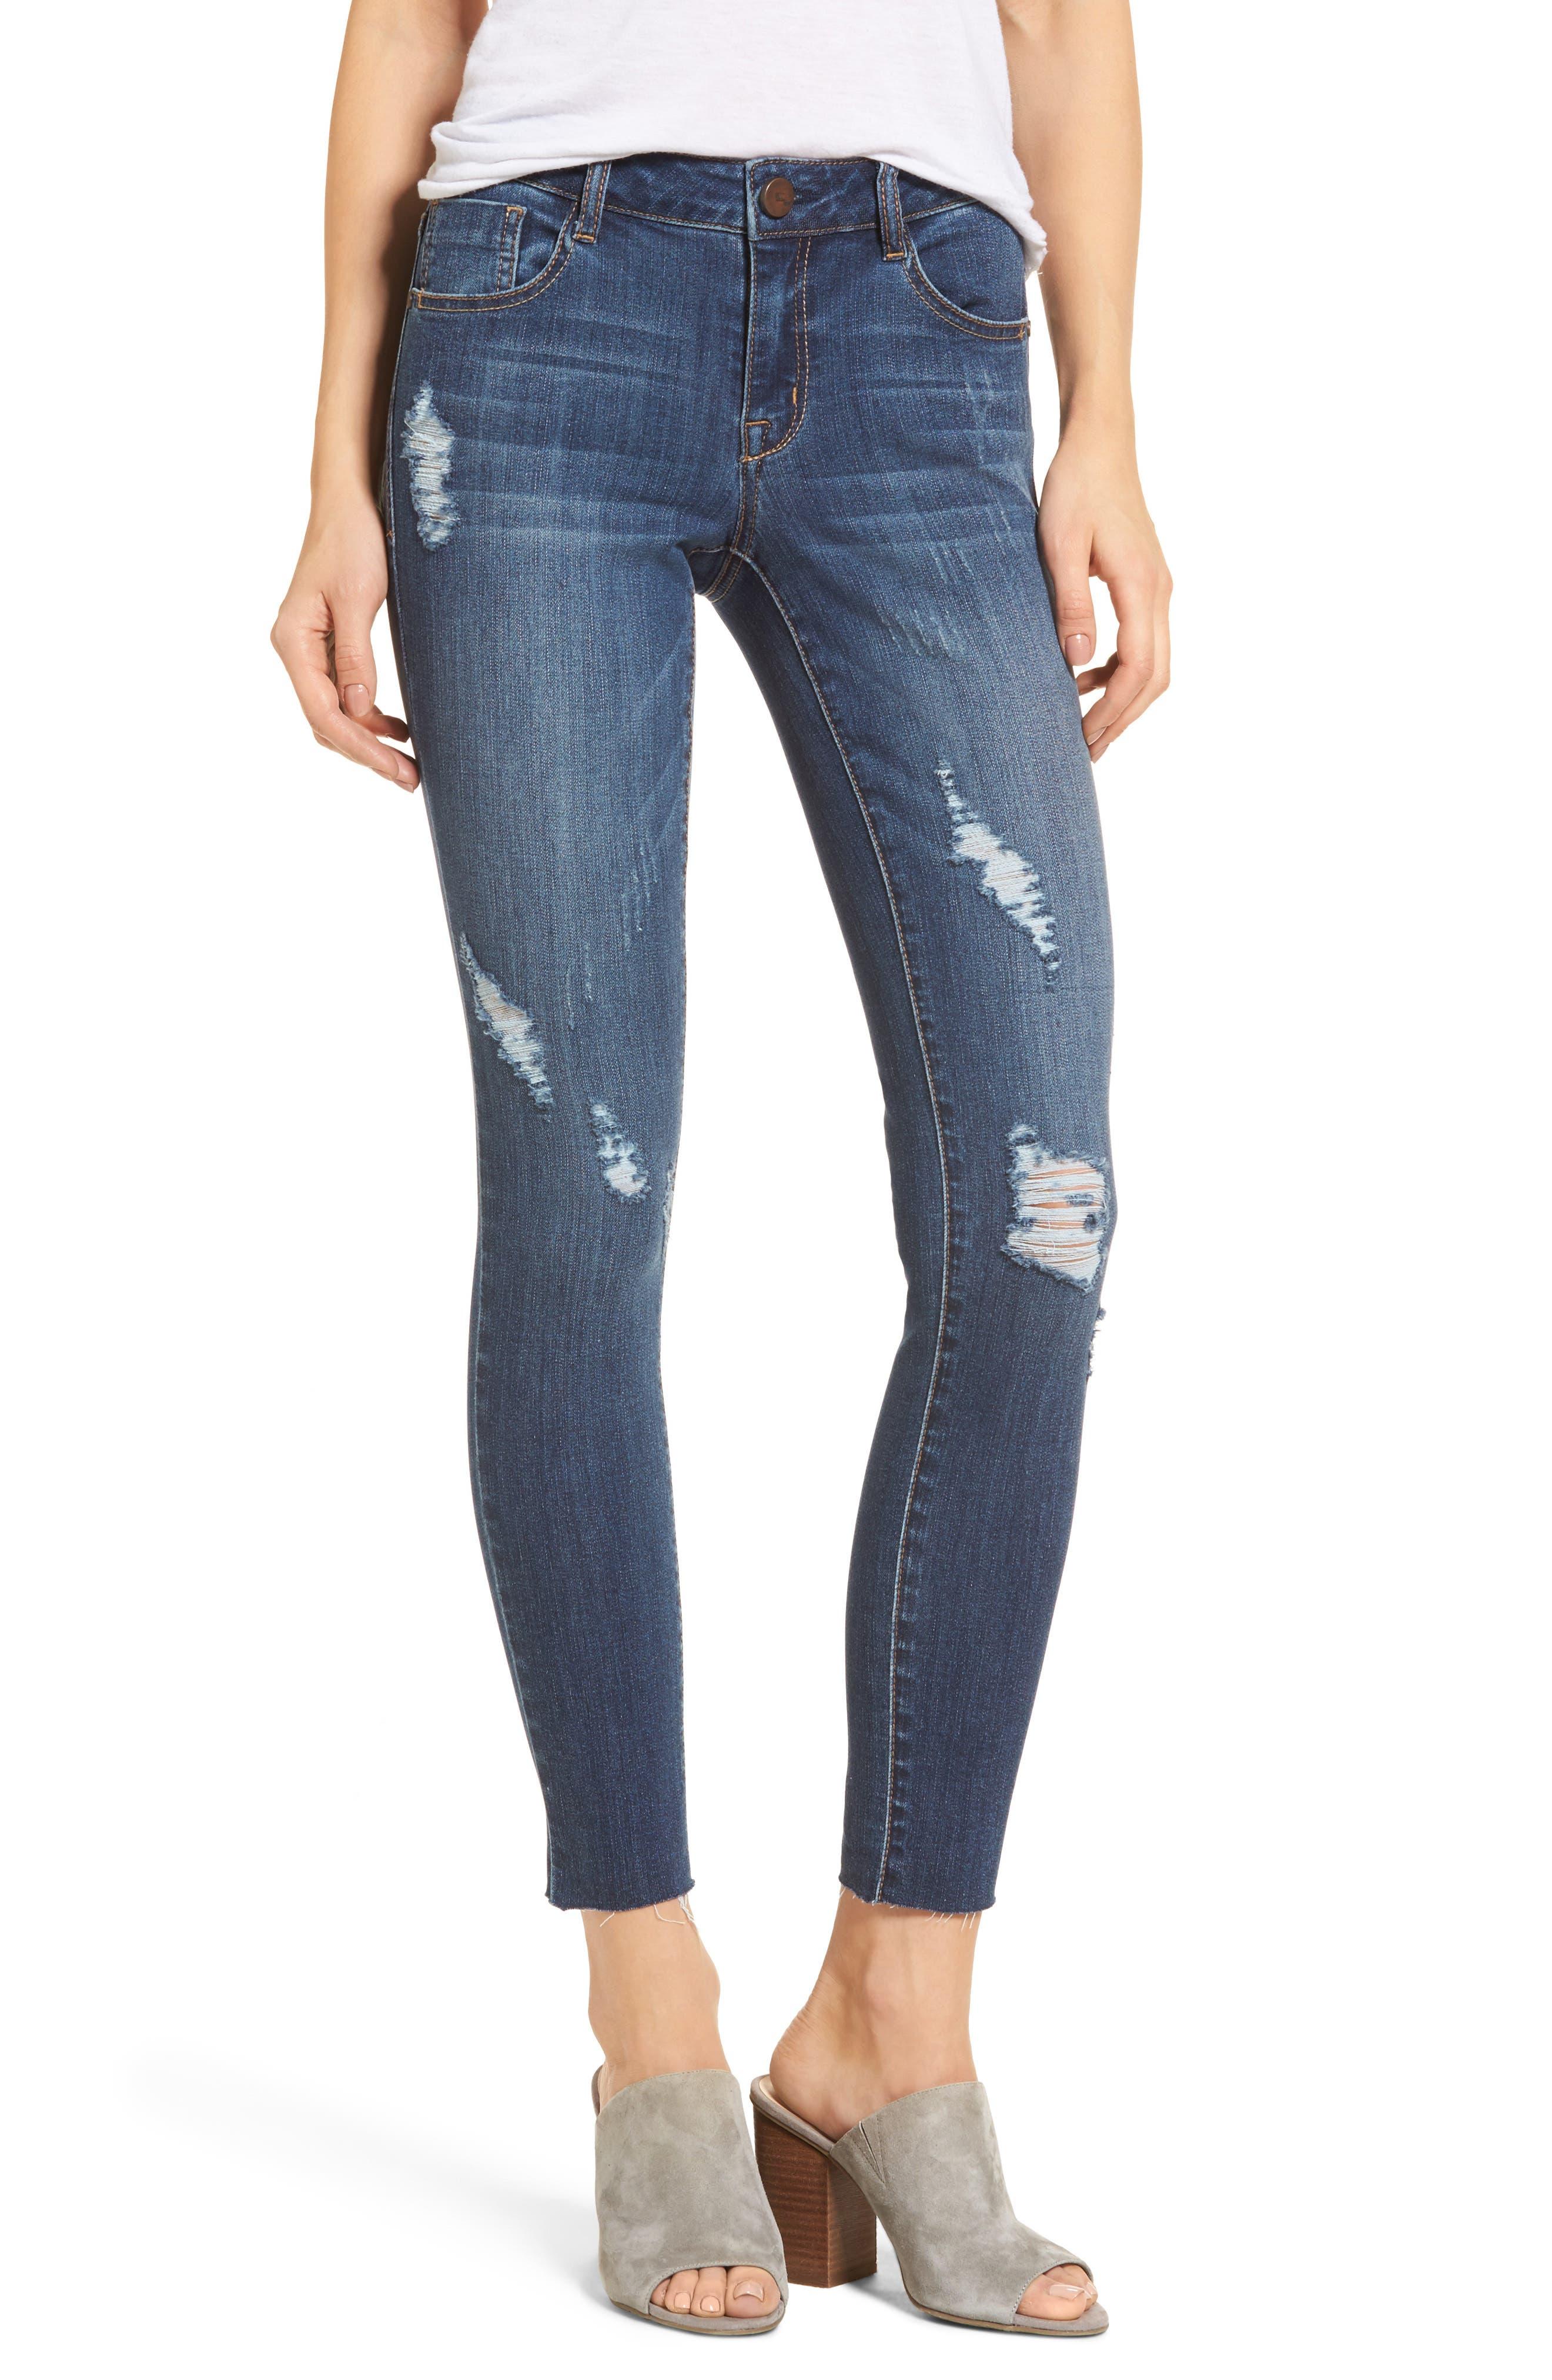 1822 Denim Decon Distressed Skinny Jeans (Wall Flowers)